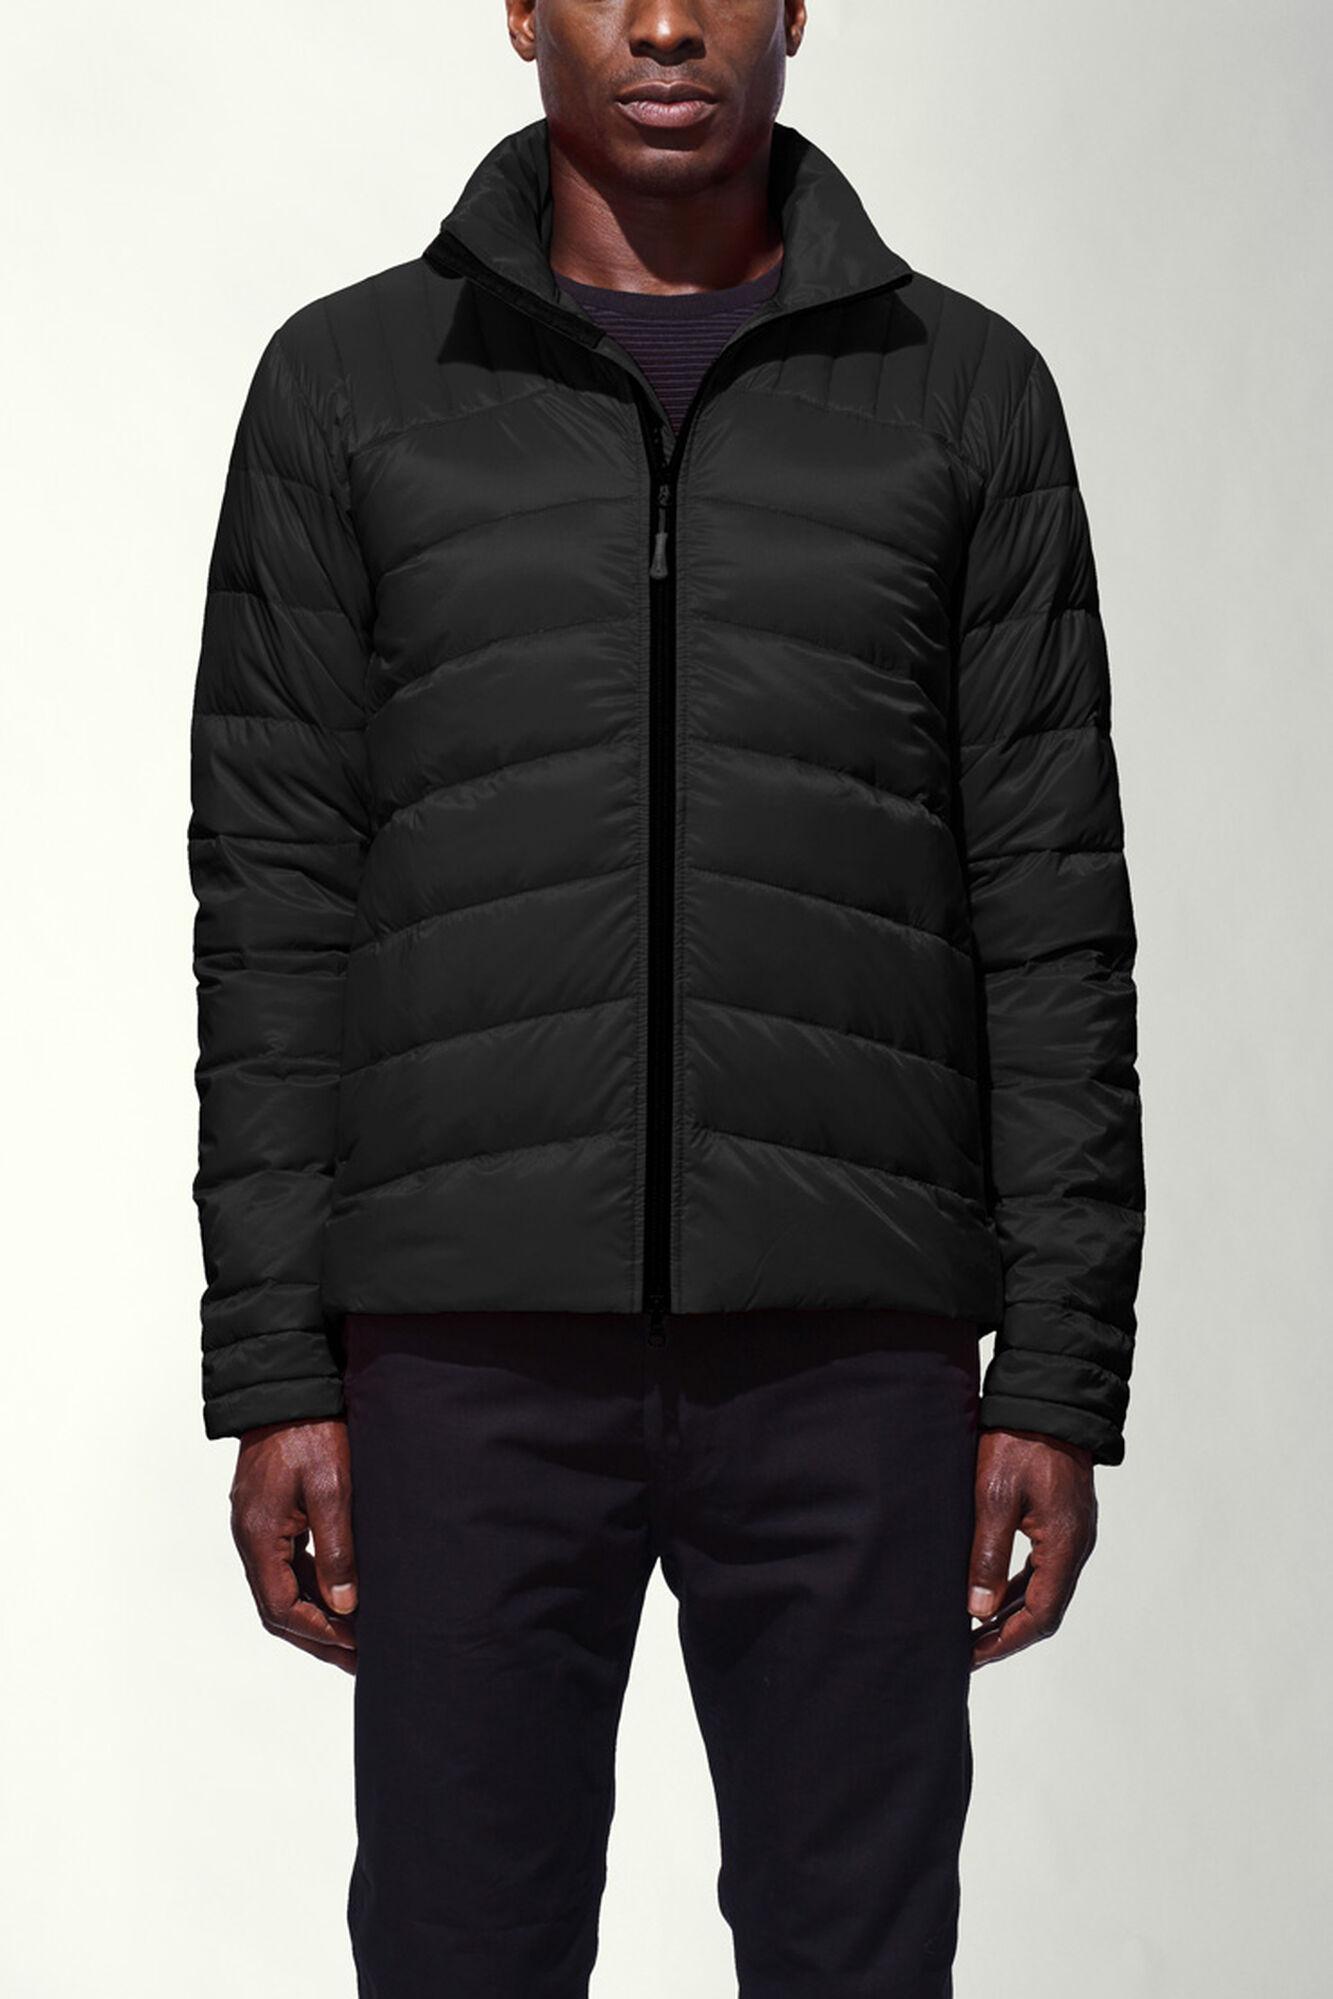 Where can i buy a blazer jacket